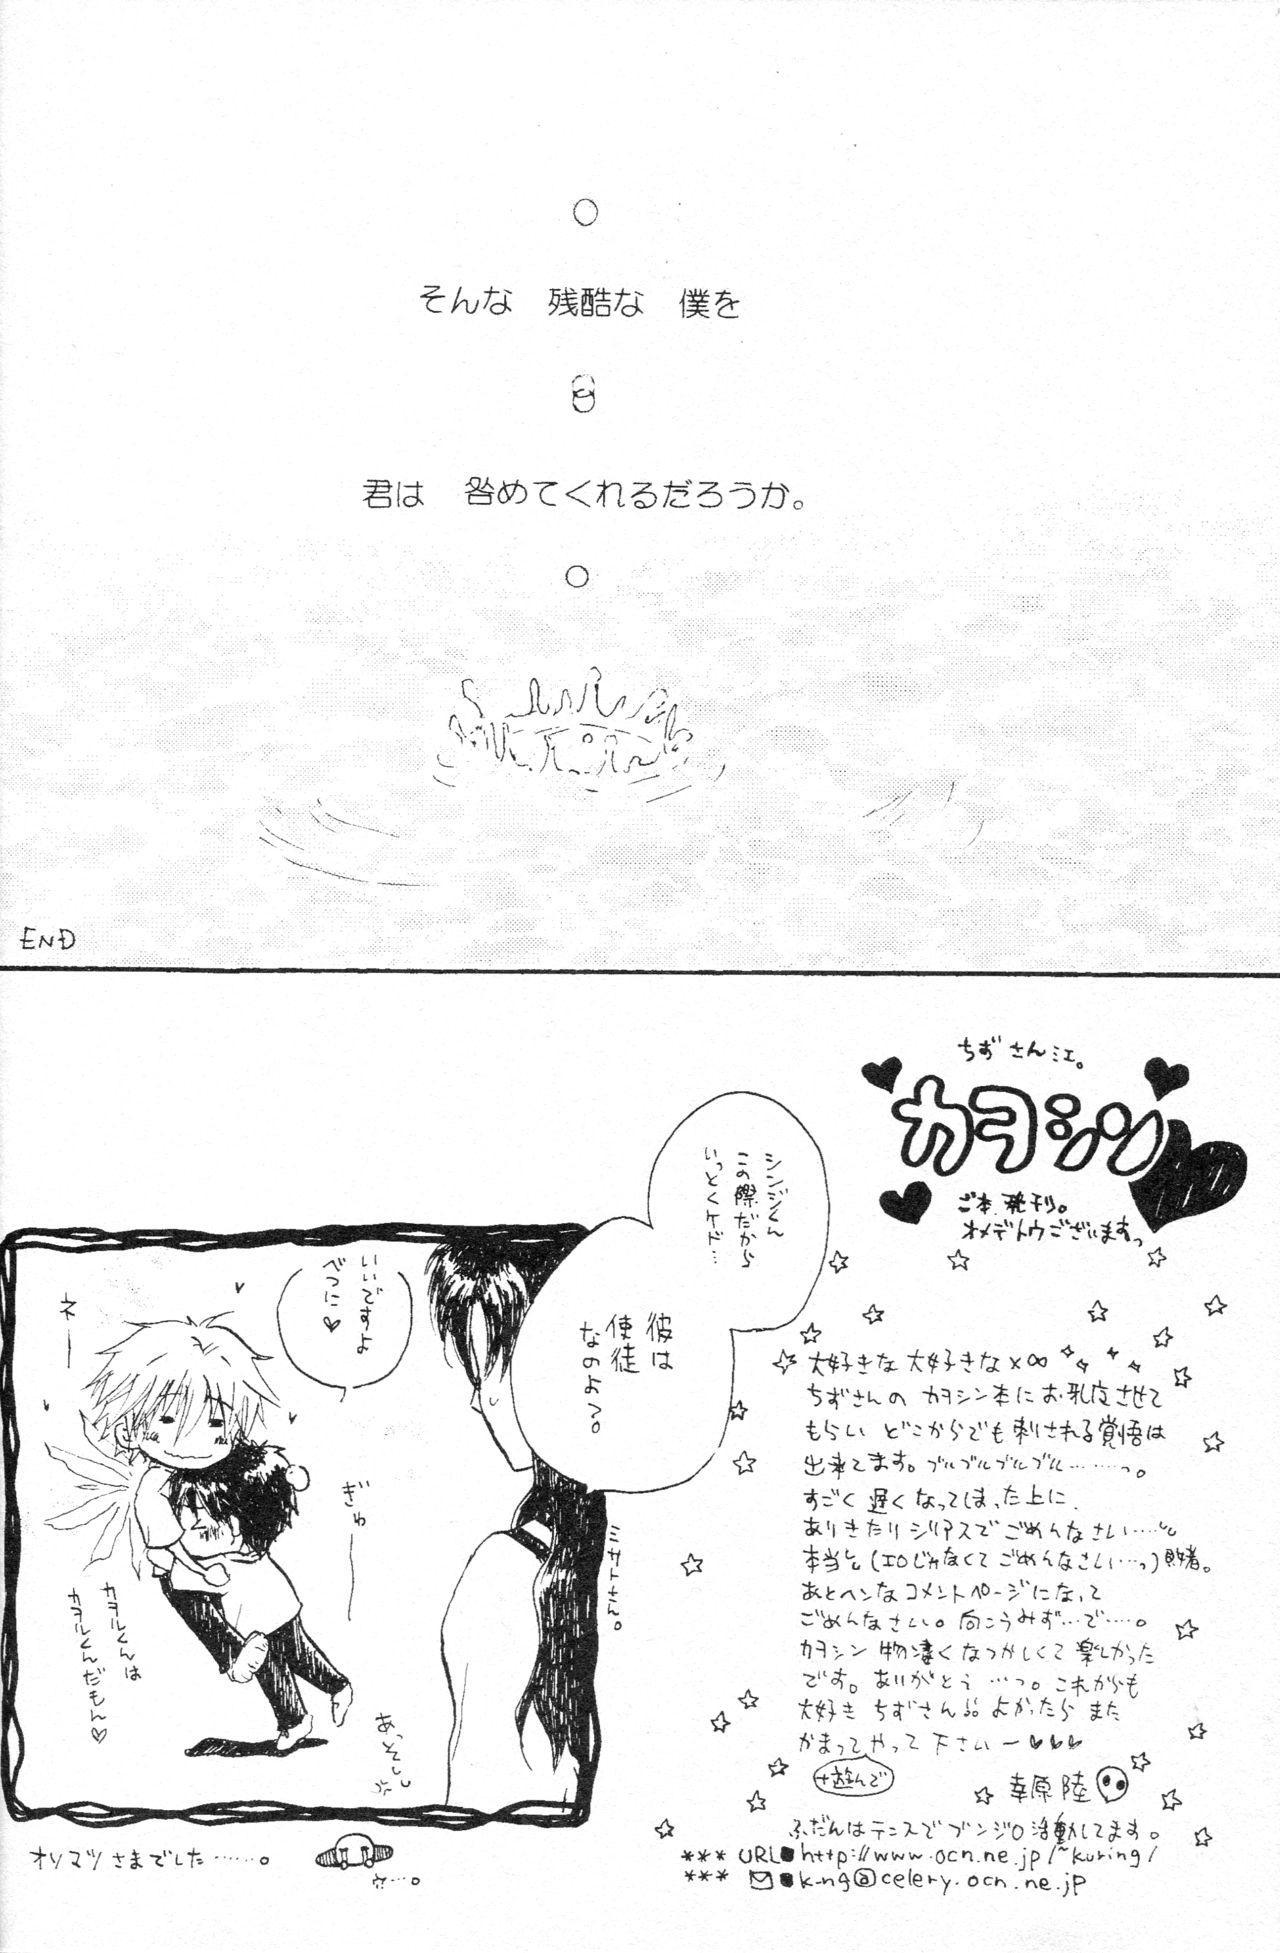 PSP Eva 2 no Susume 24